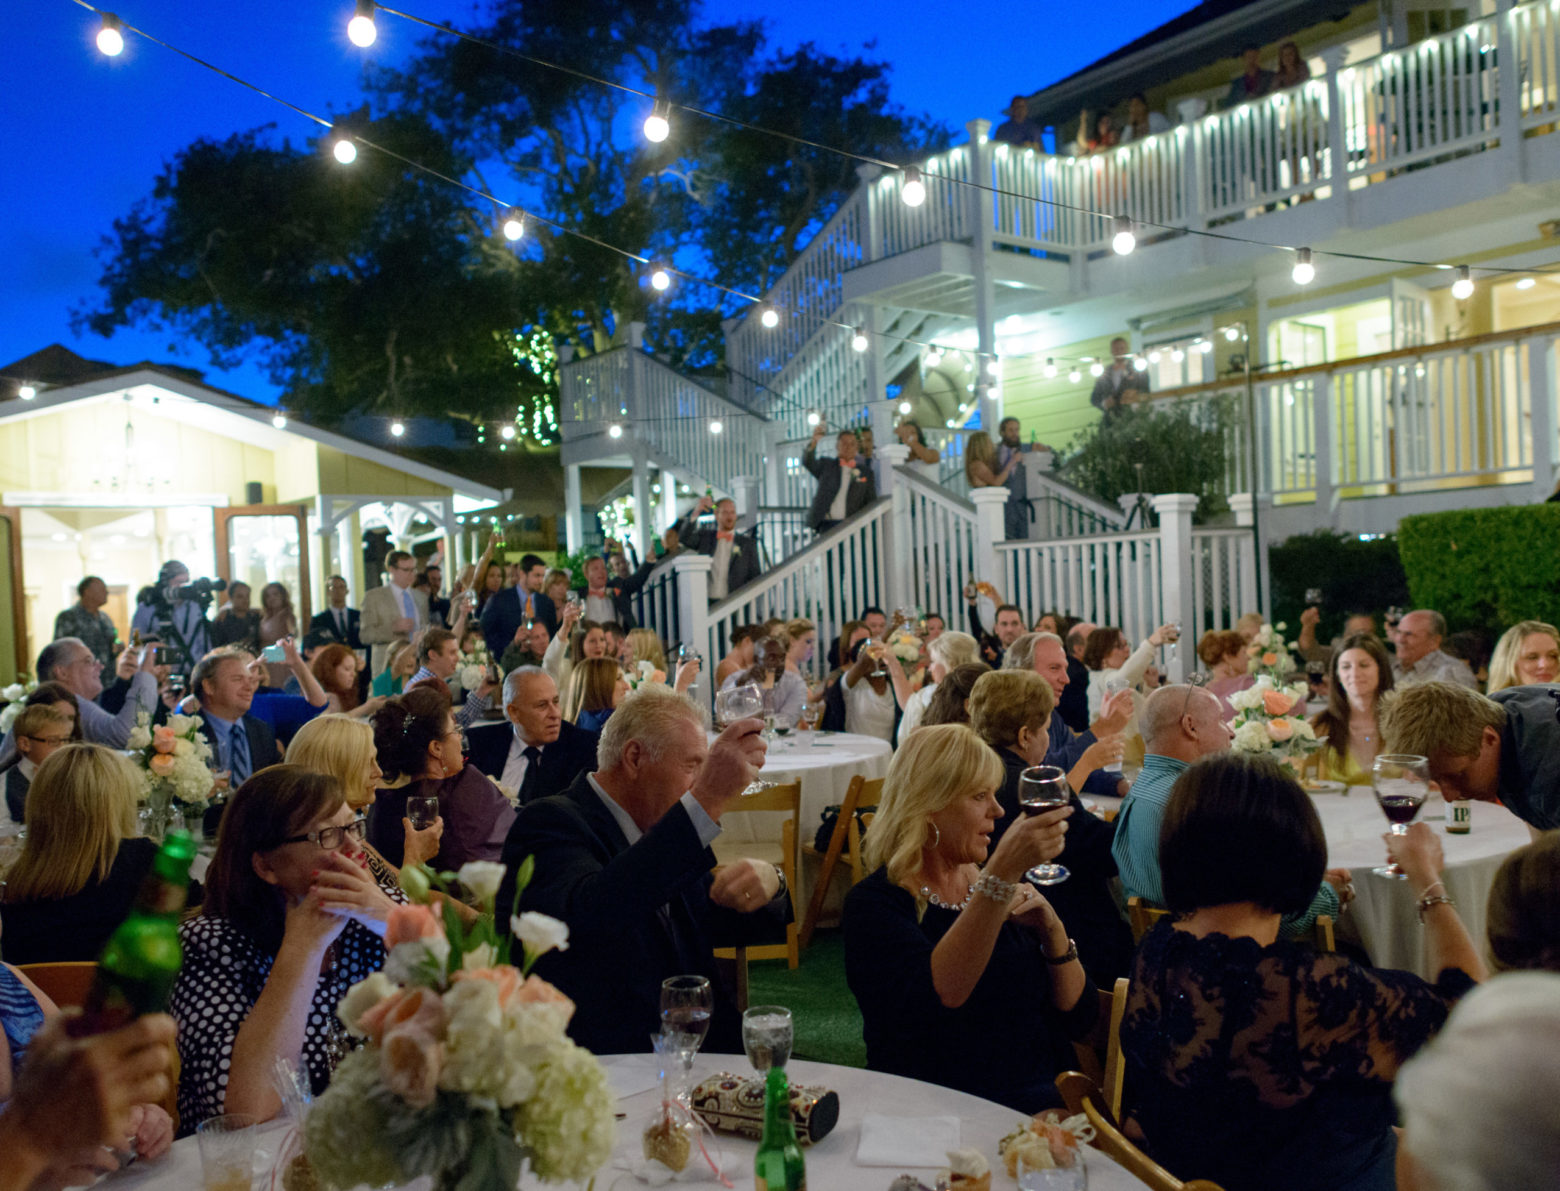 Garden Wedding Reception area at The Perry House